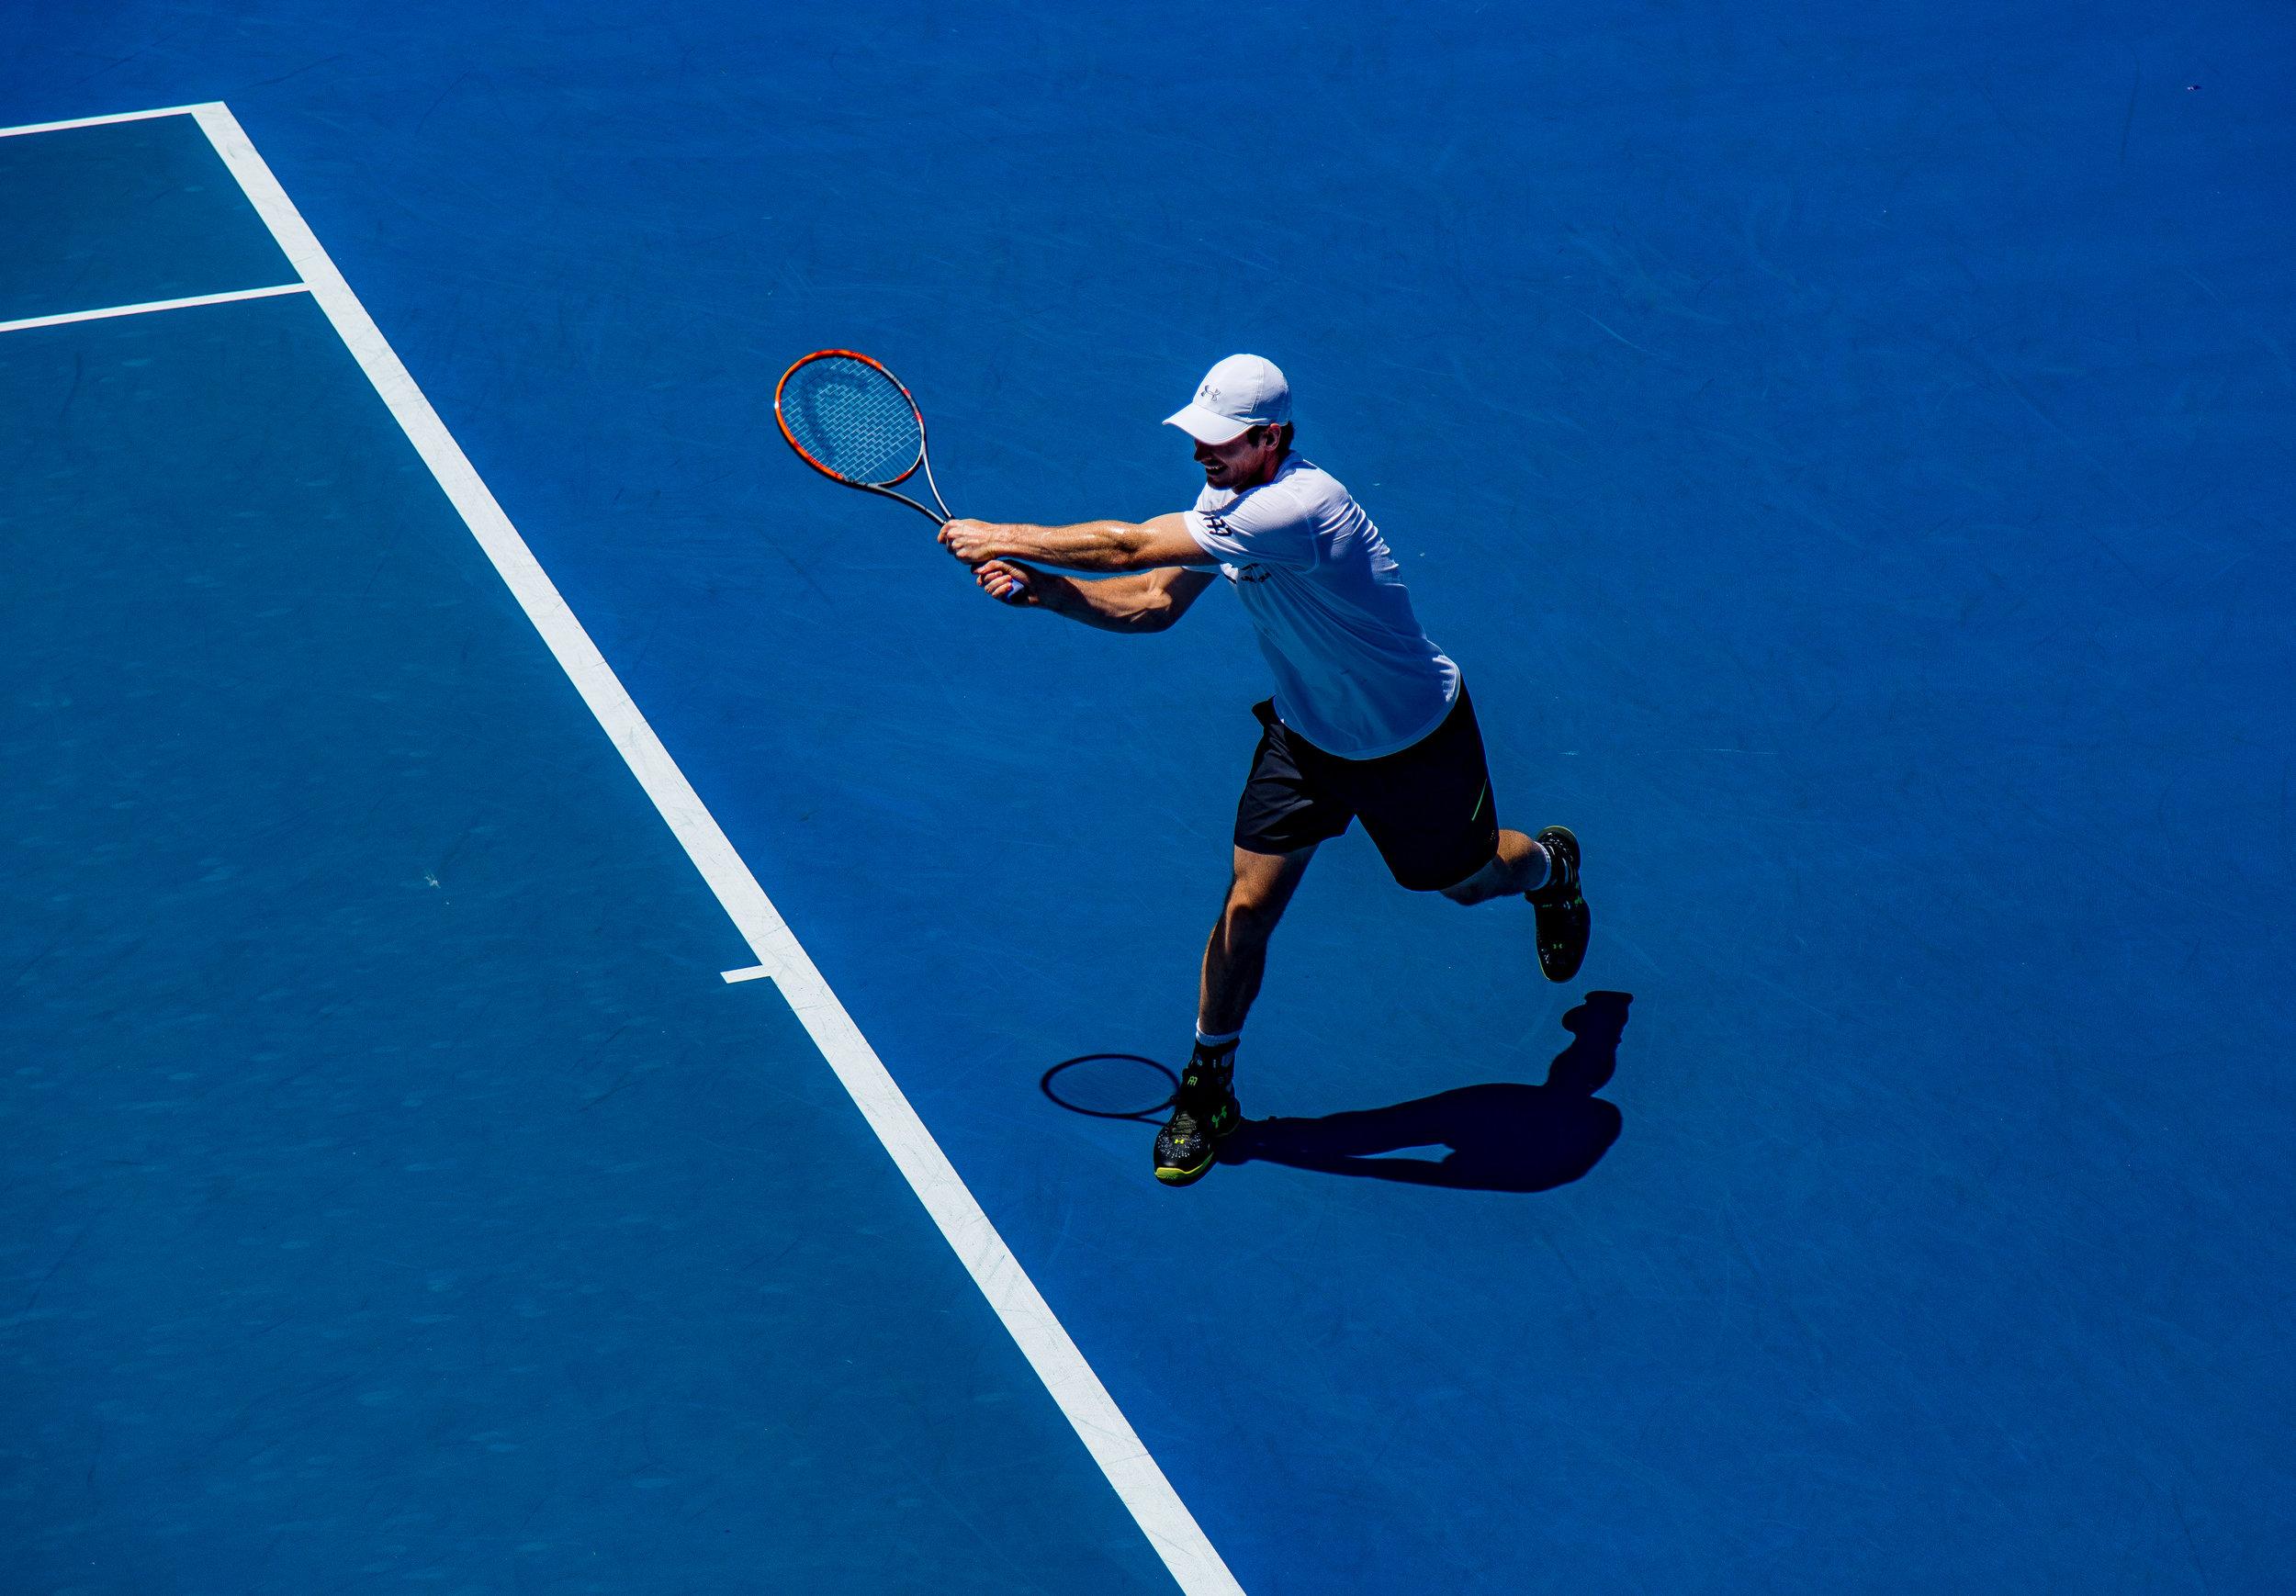 Tennis (singles) = Vigorous Intensity